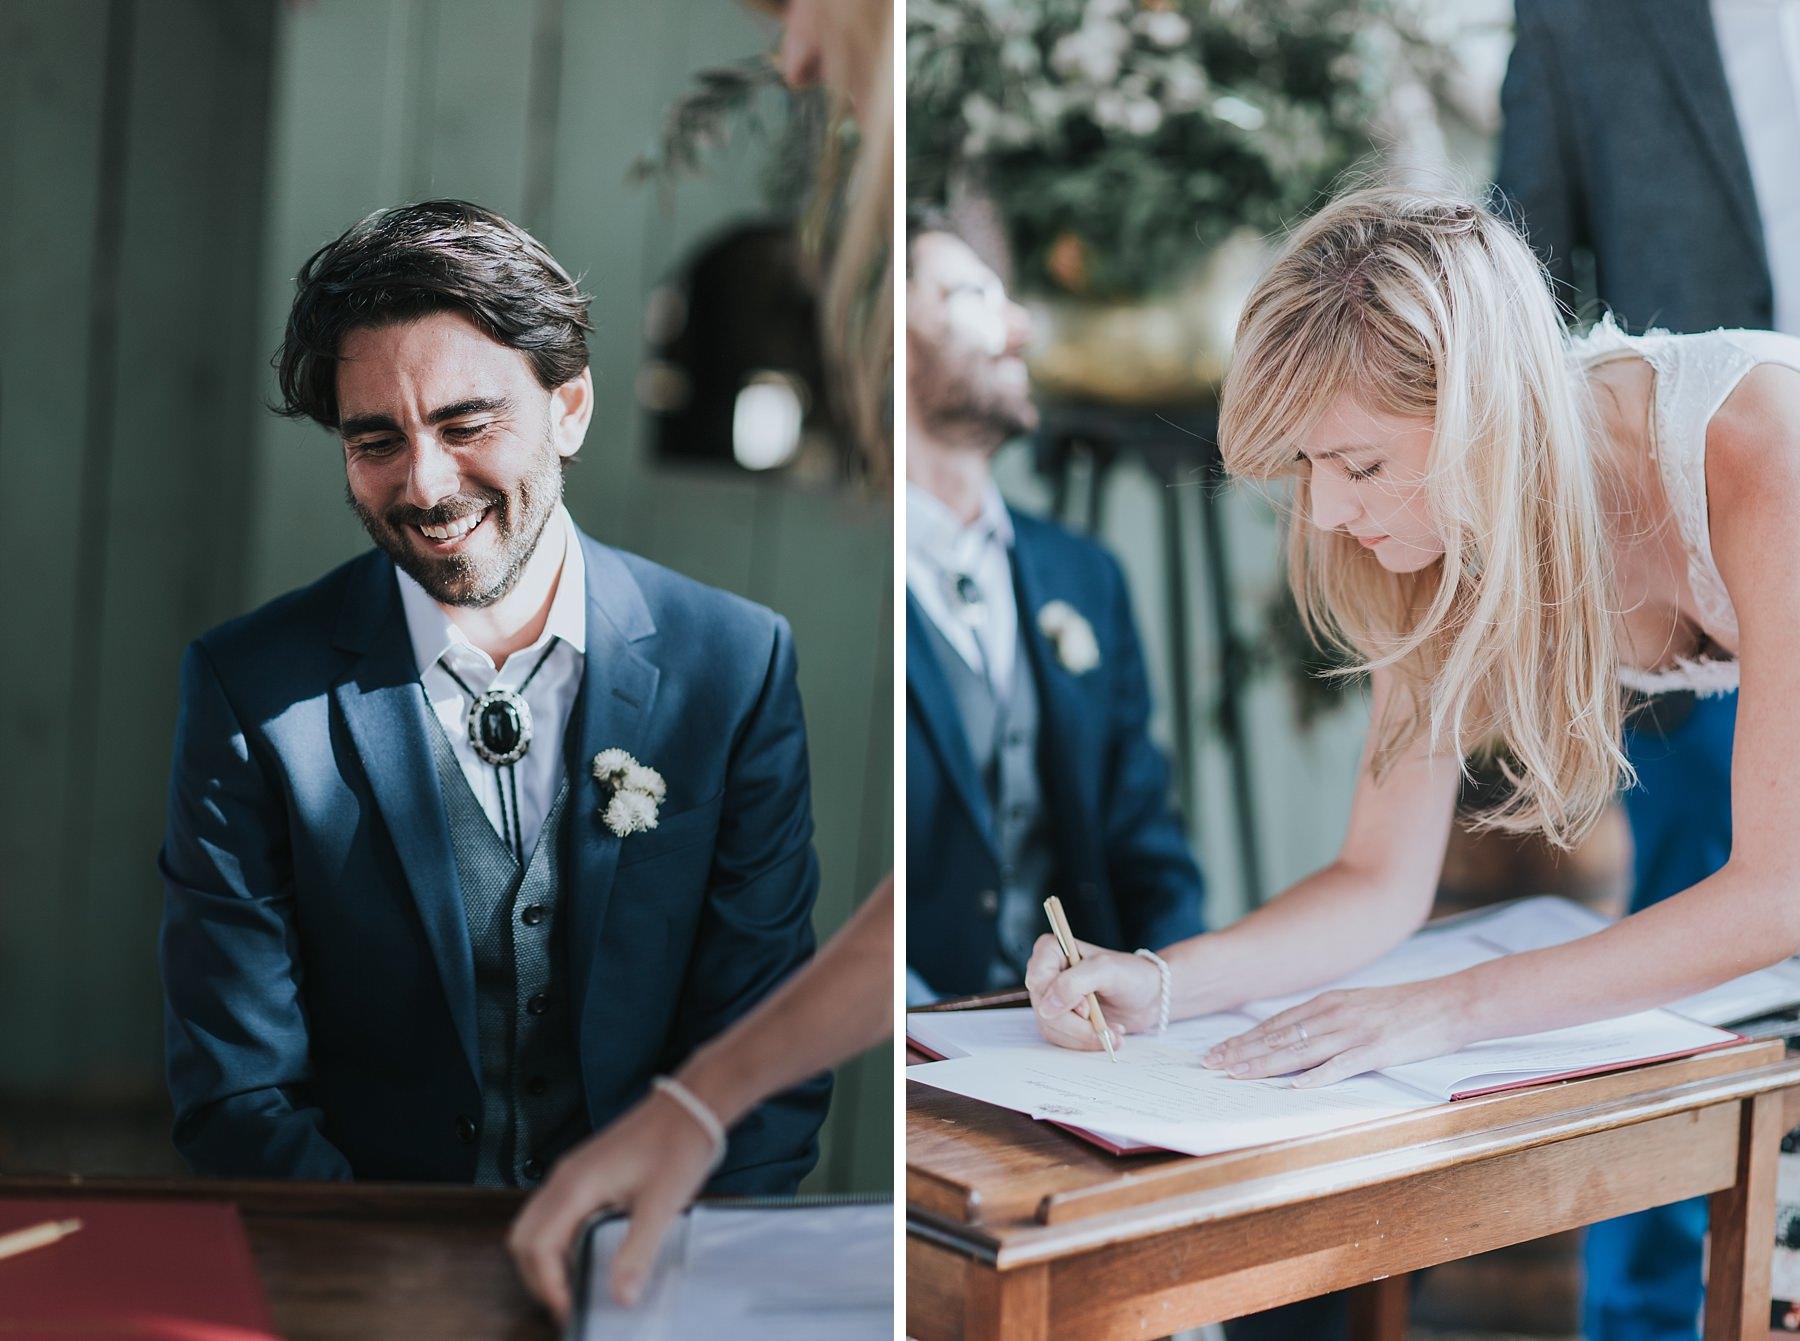 wedding day natural portraiture